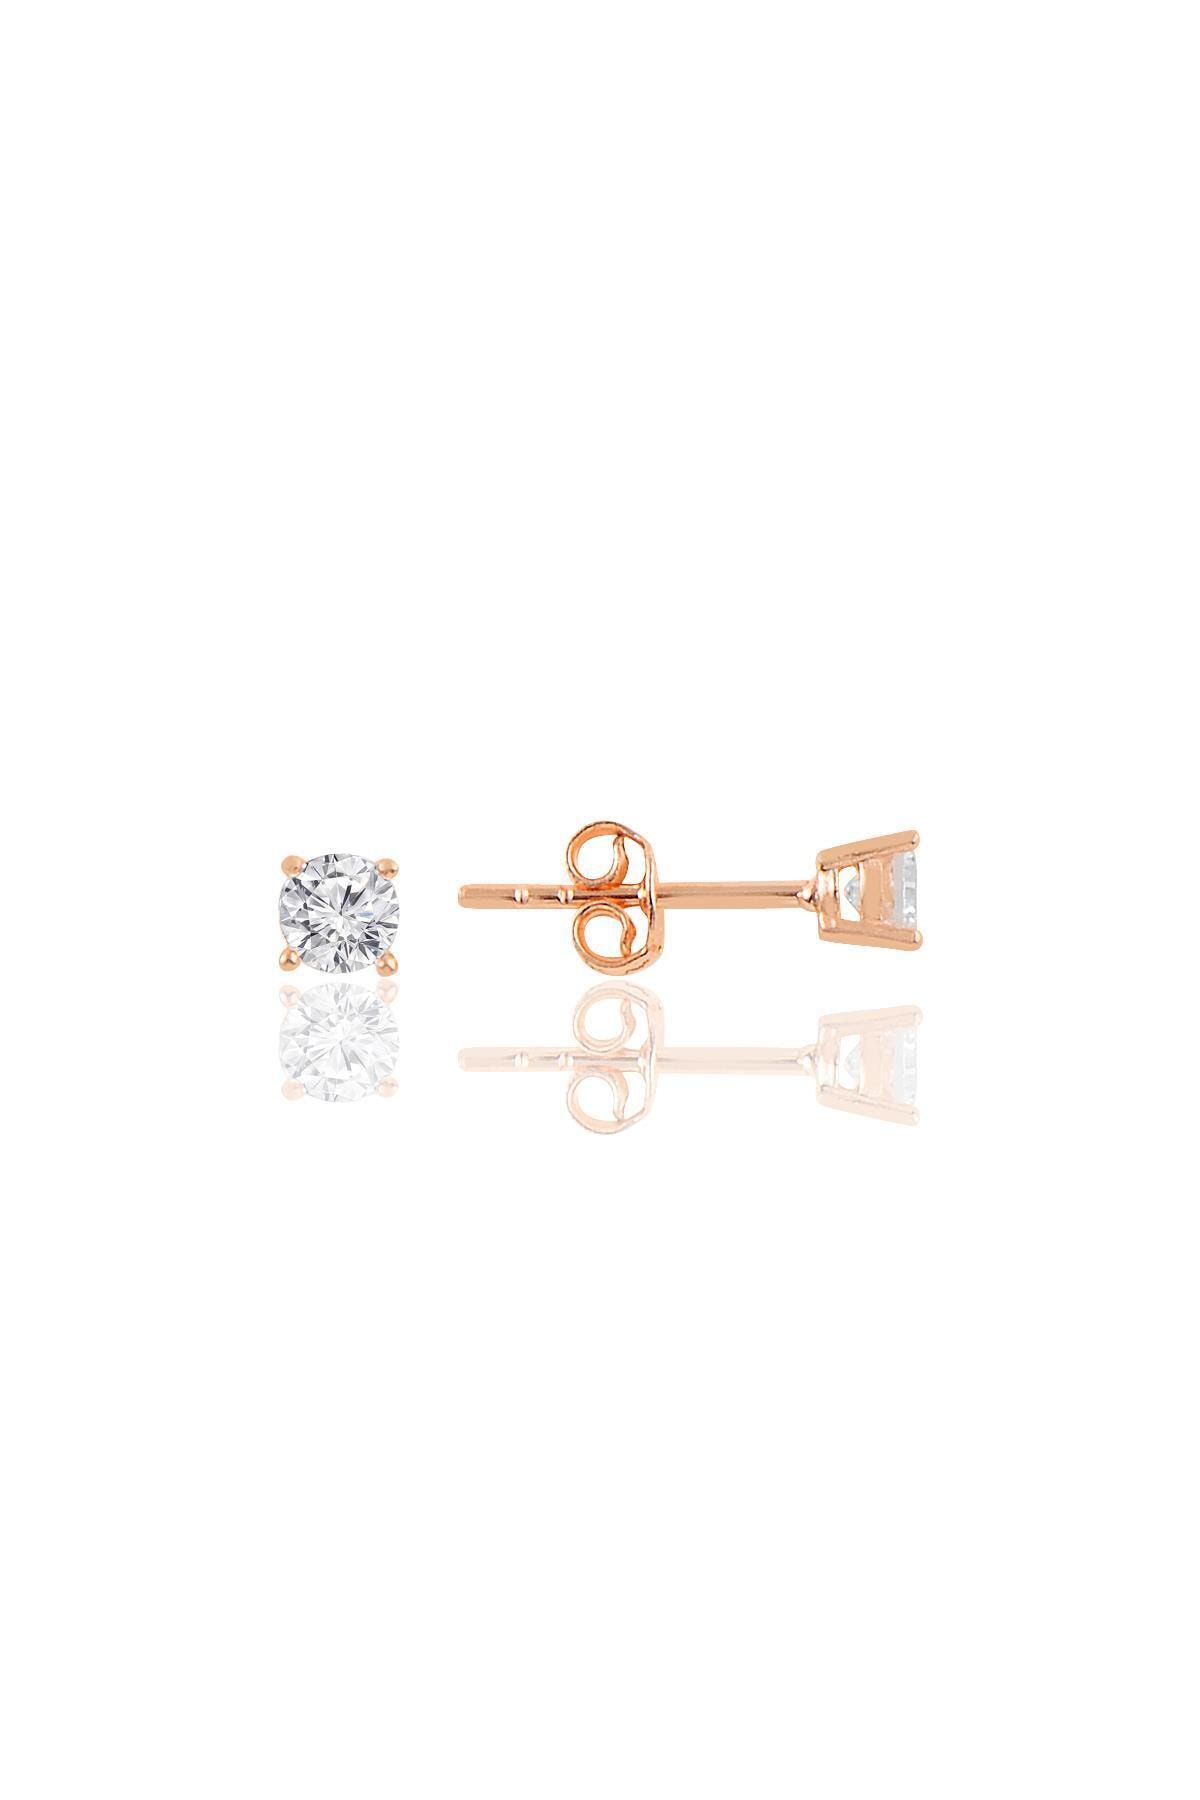 Söğütlü Silver Gümüş Rose Gümüş Tek Taş Küpe 1